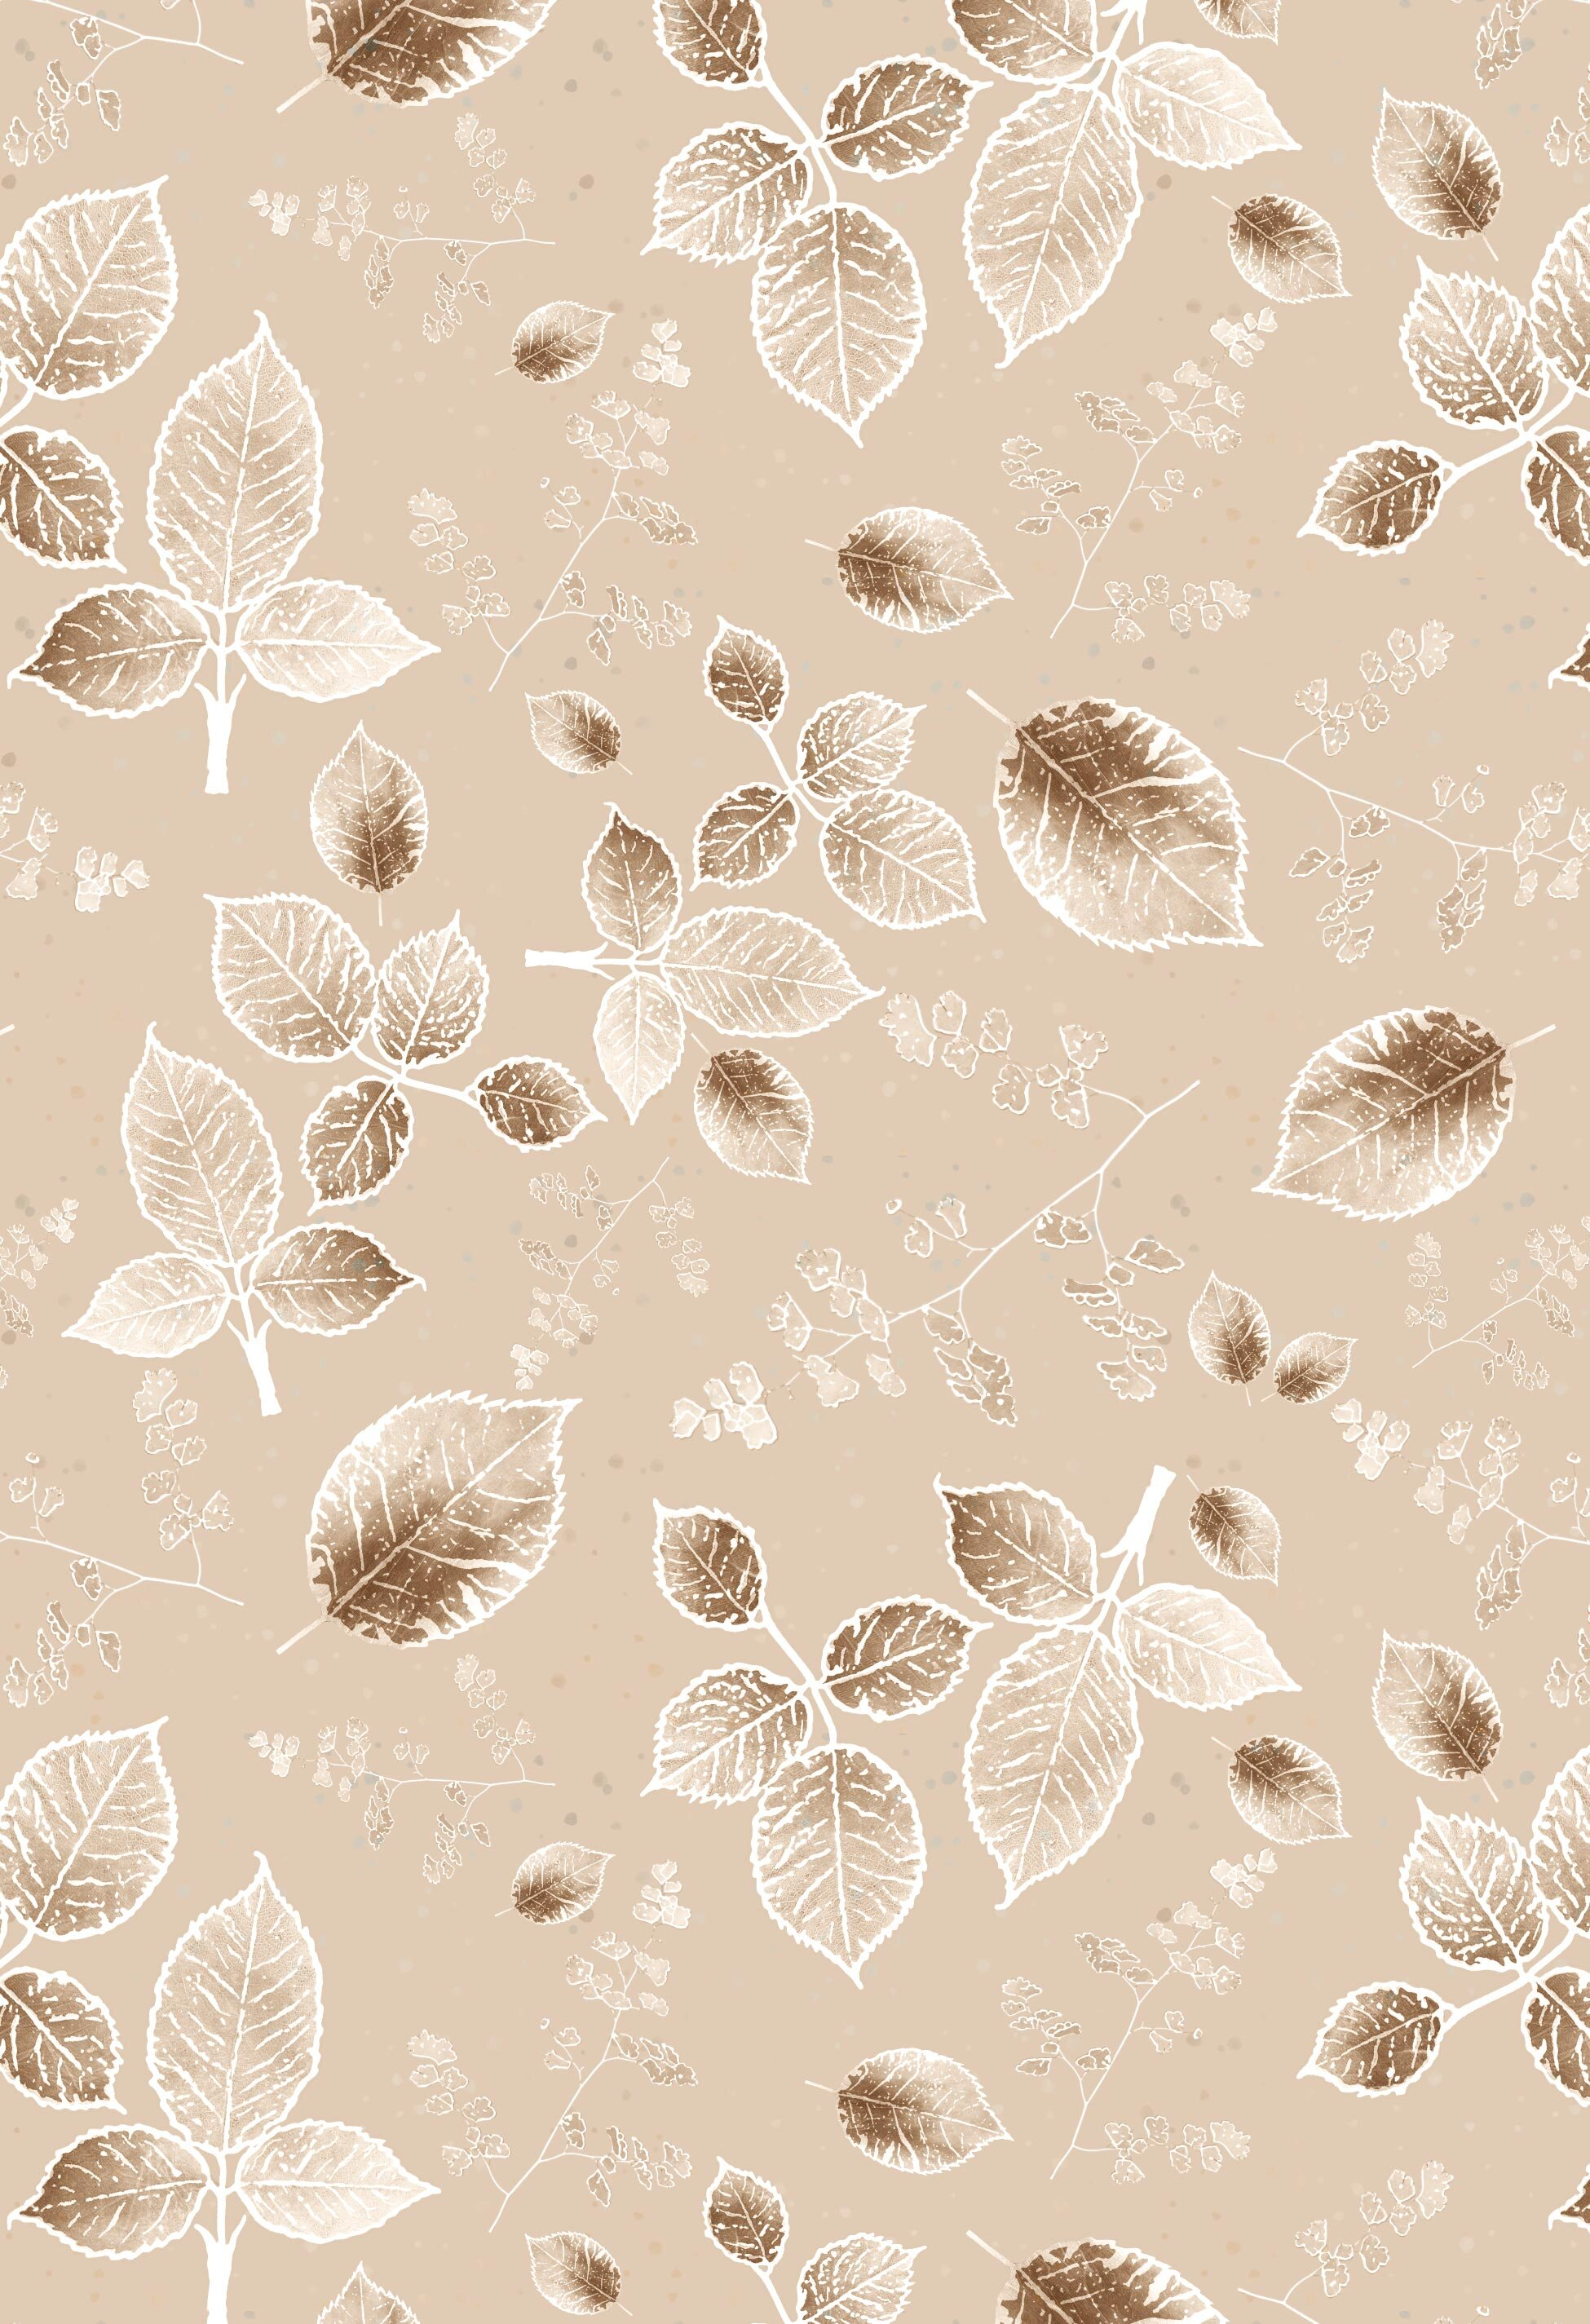 scattered rose monotone background latte beige2.jpg